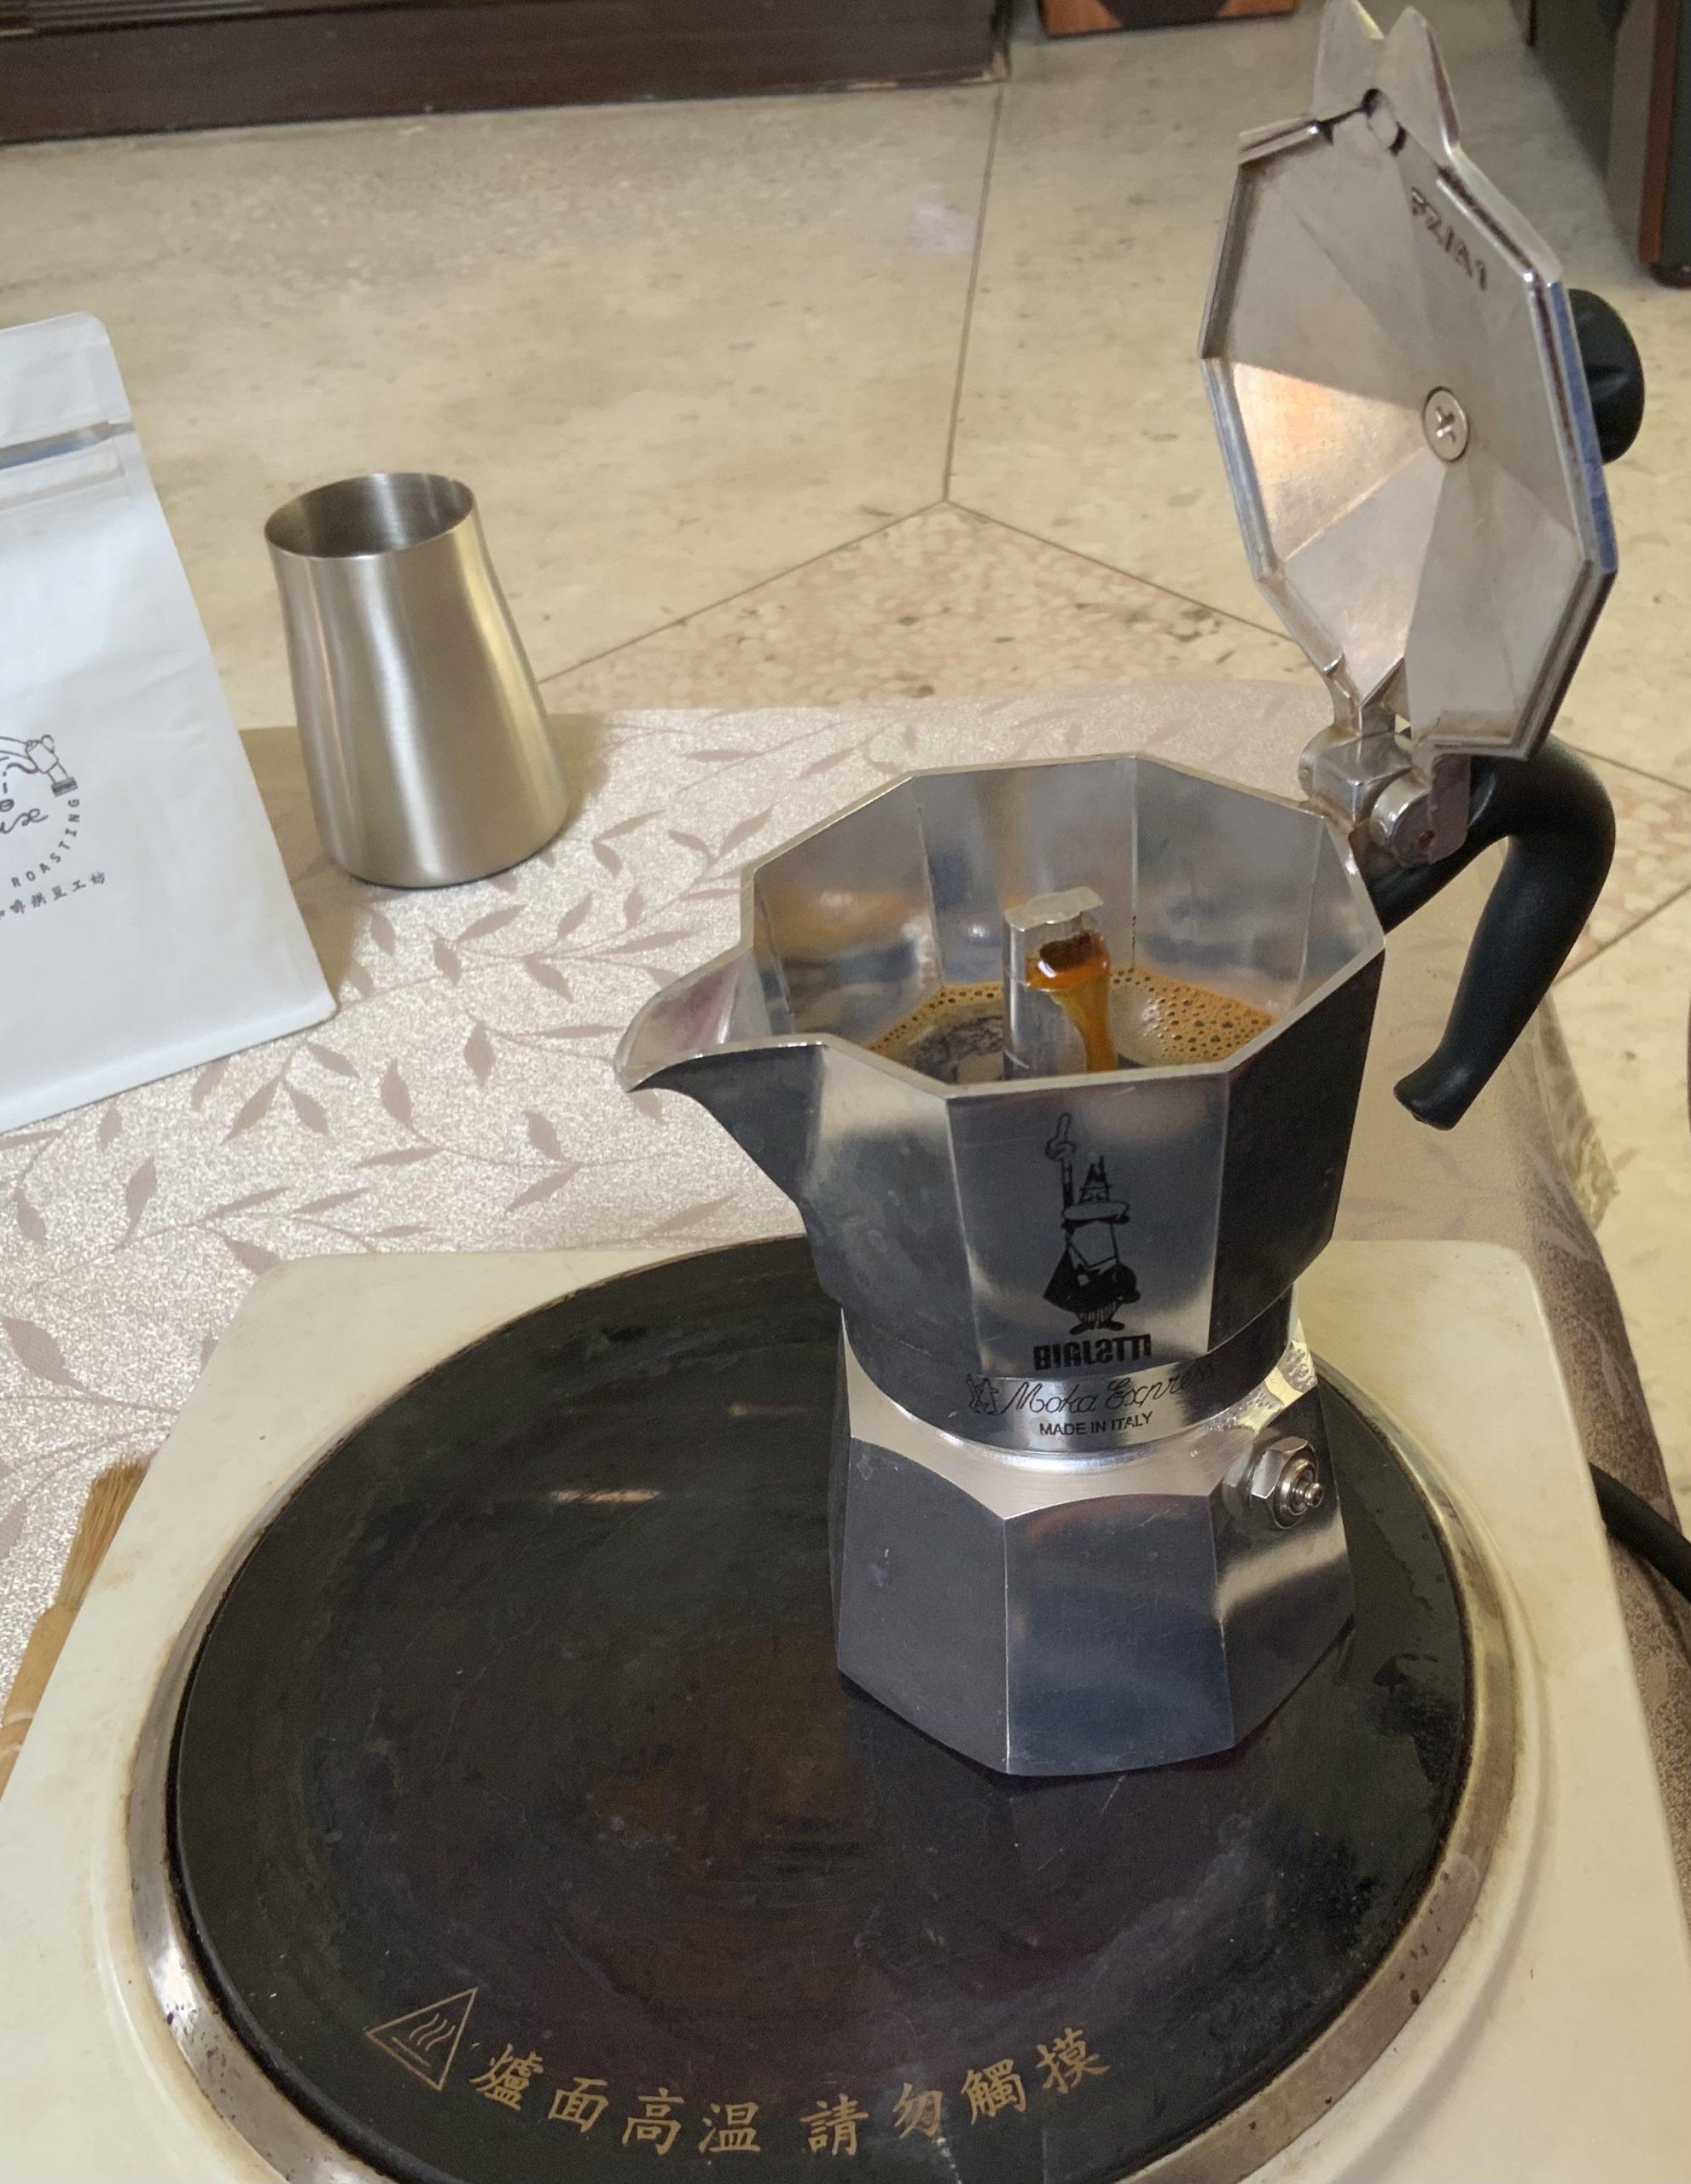 TN姐姐 摩卡壼 咖啡